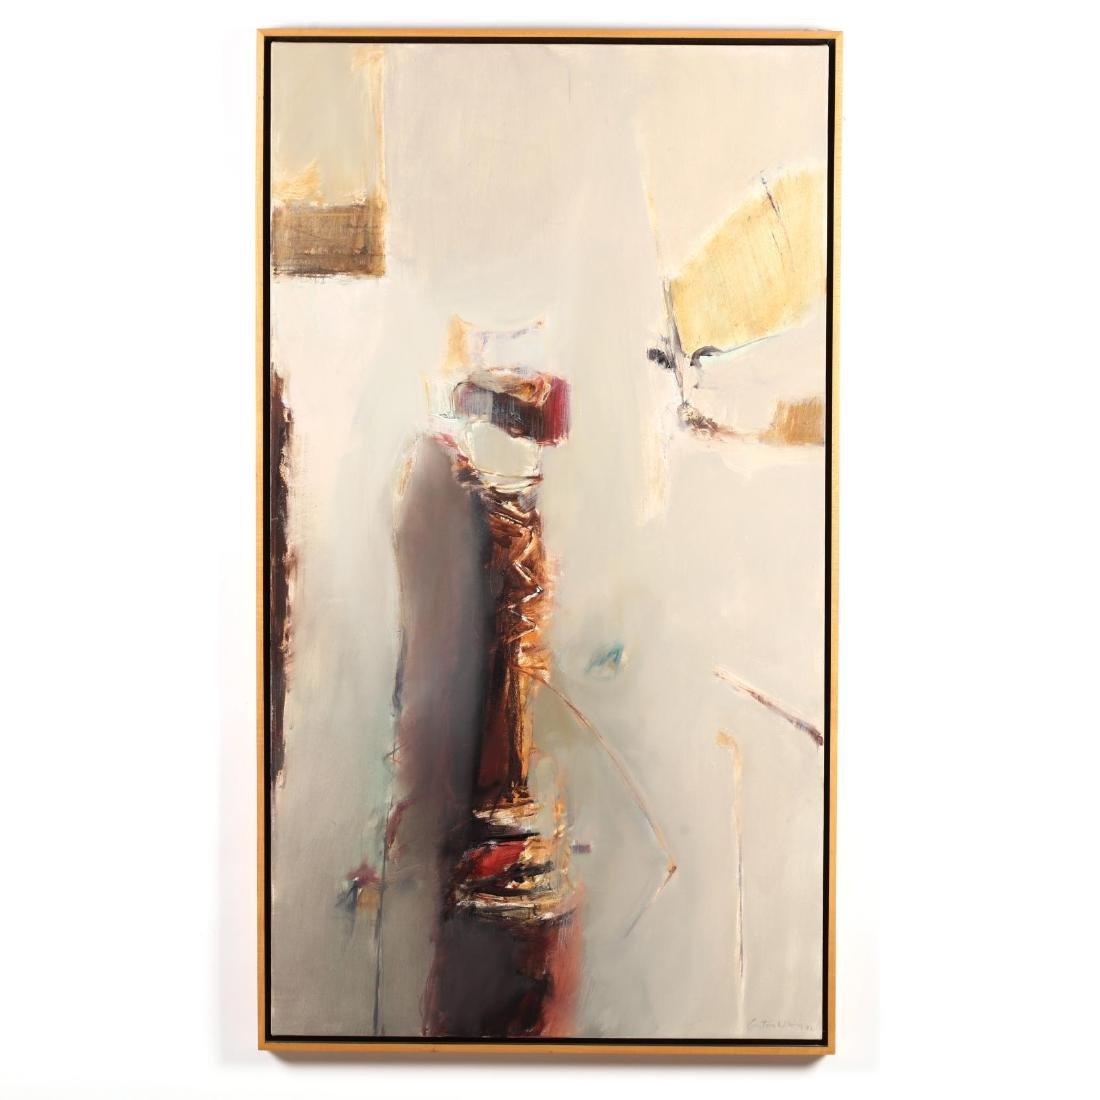 Anton Weiss (TN, b. 1936), Untitled